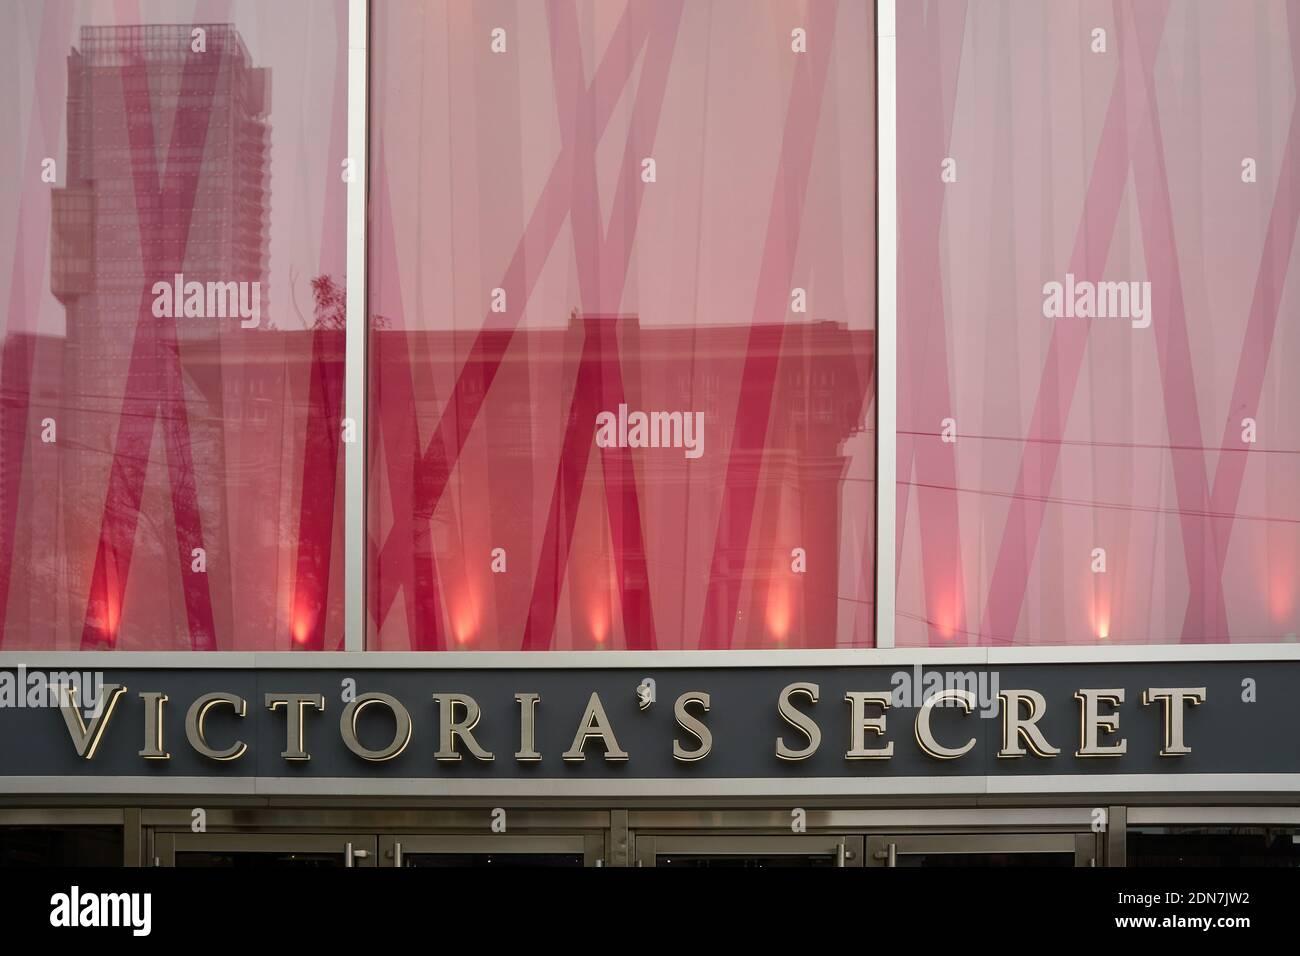 victorias-secret-lingerie-and-womens-clo